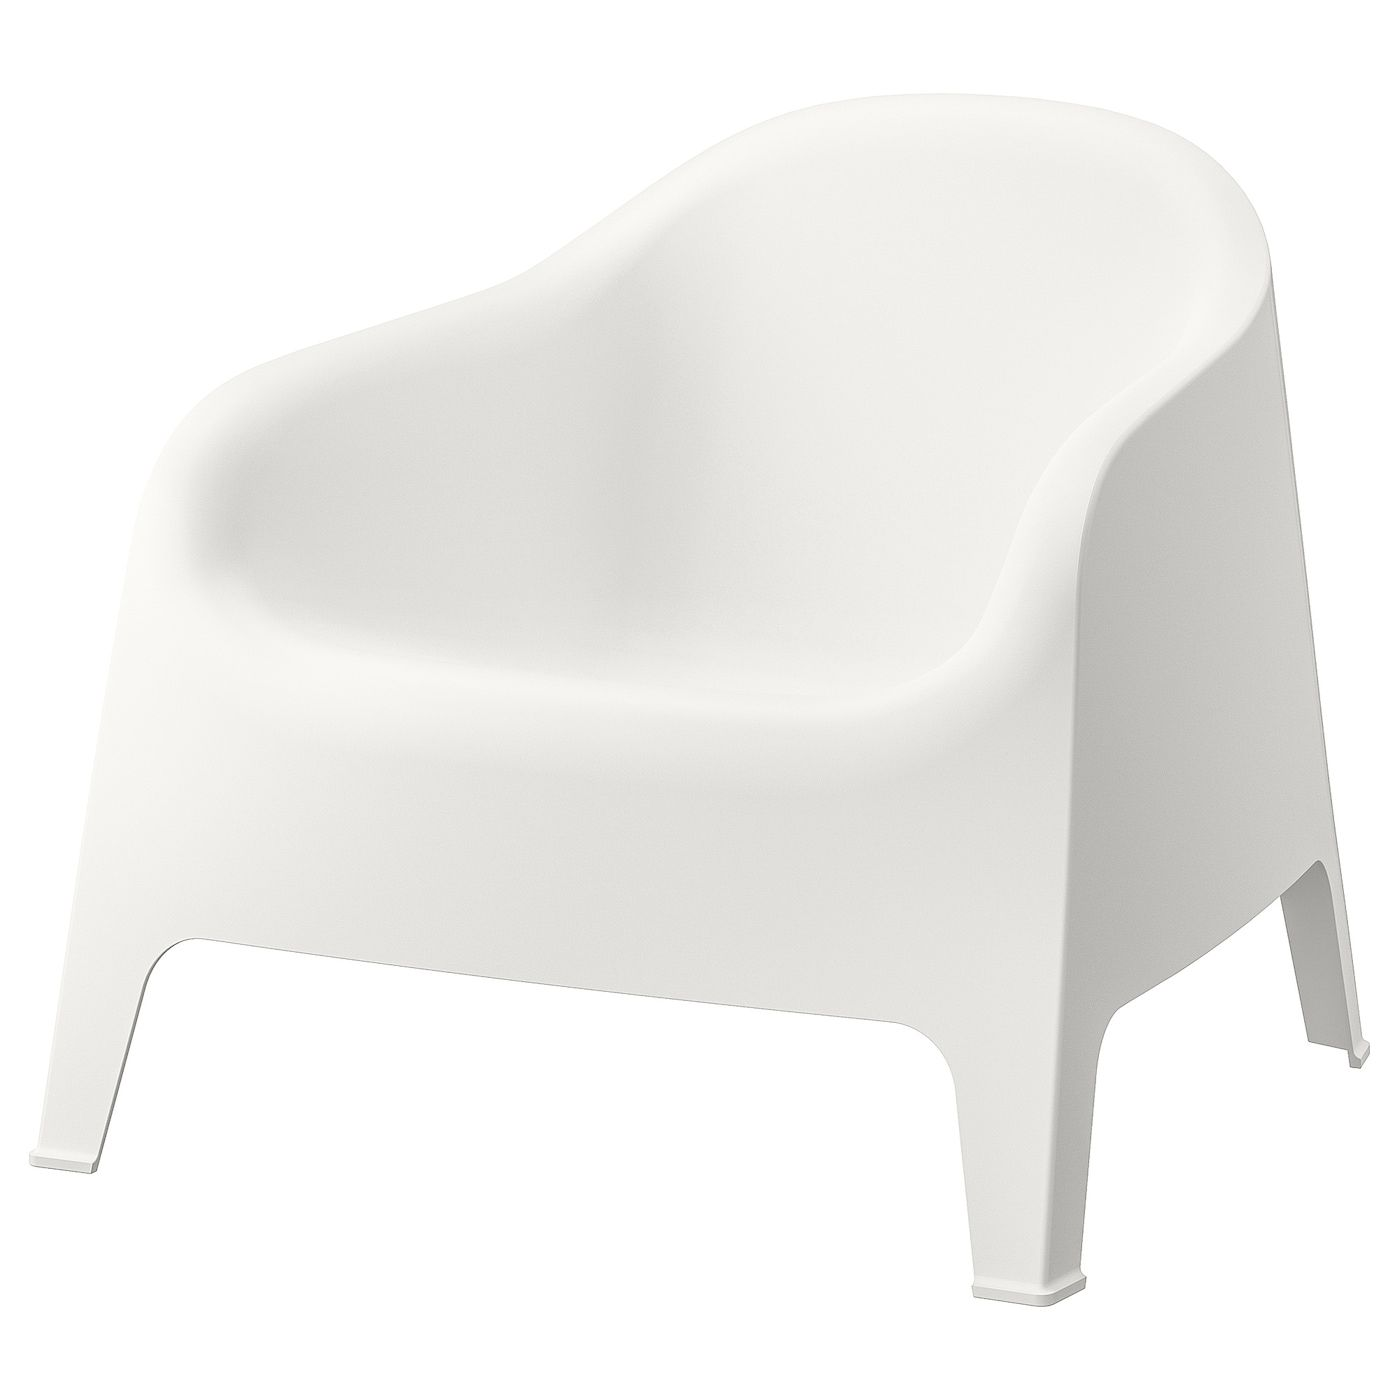 Skarpo Armchair Outdoor White In 2020 Ikea Armchair Outdoor